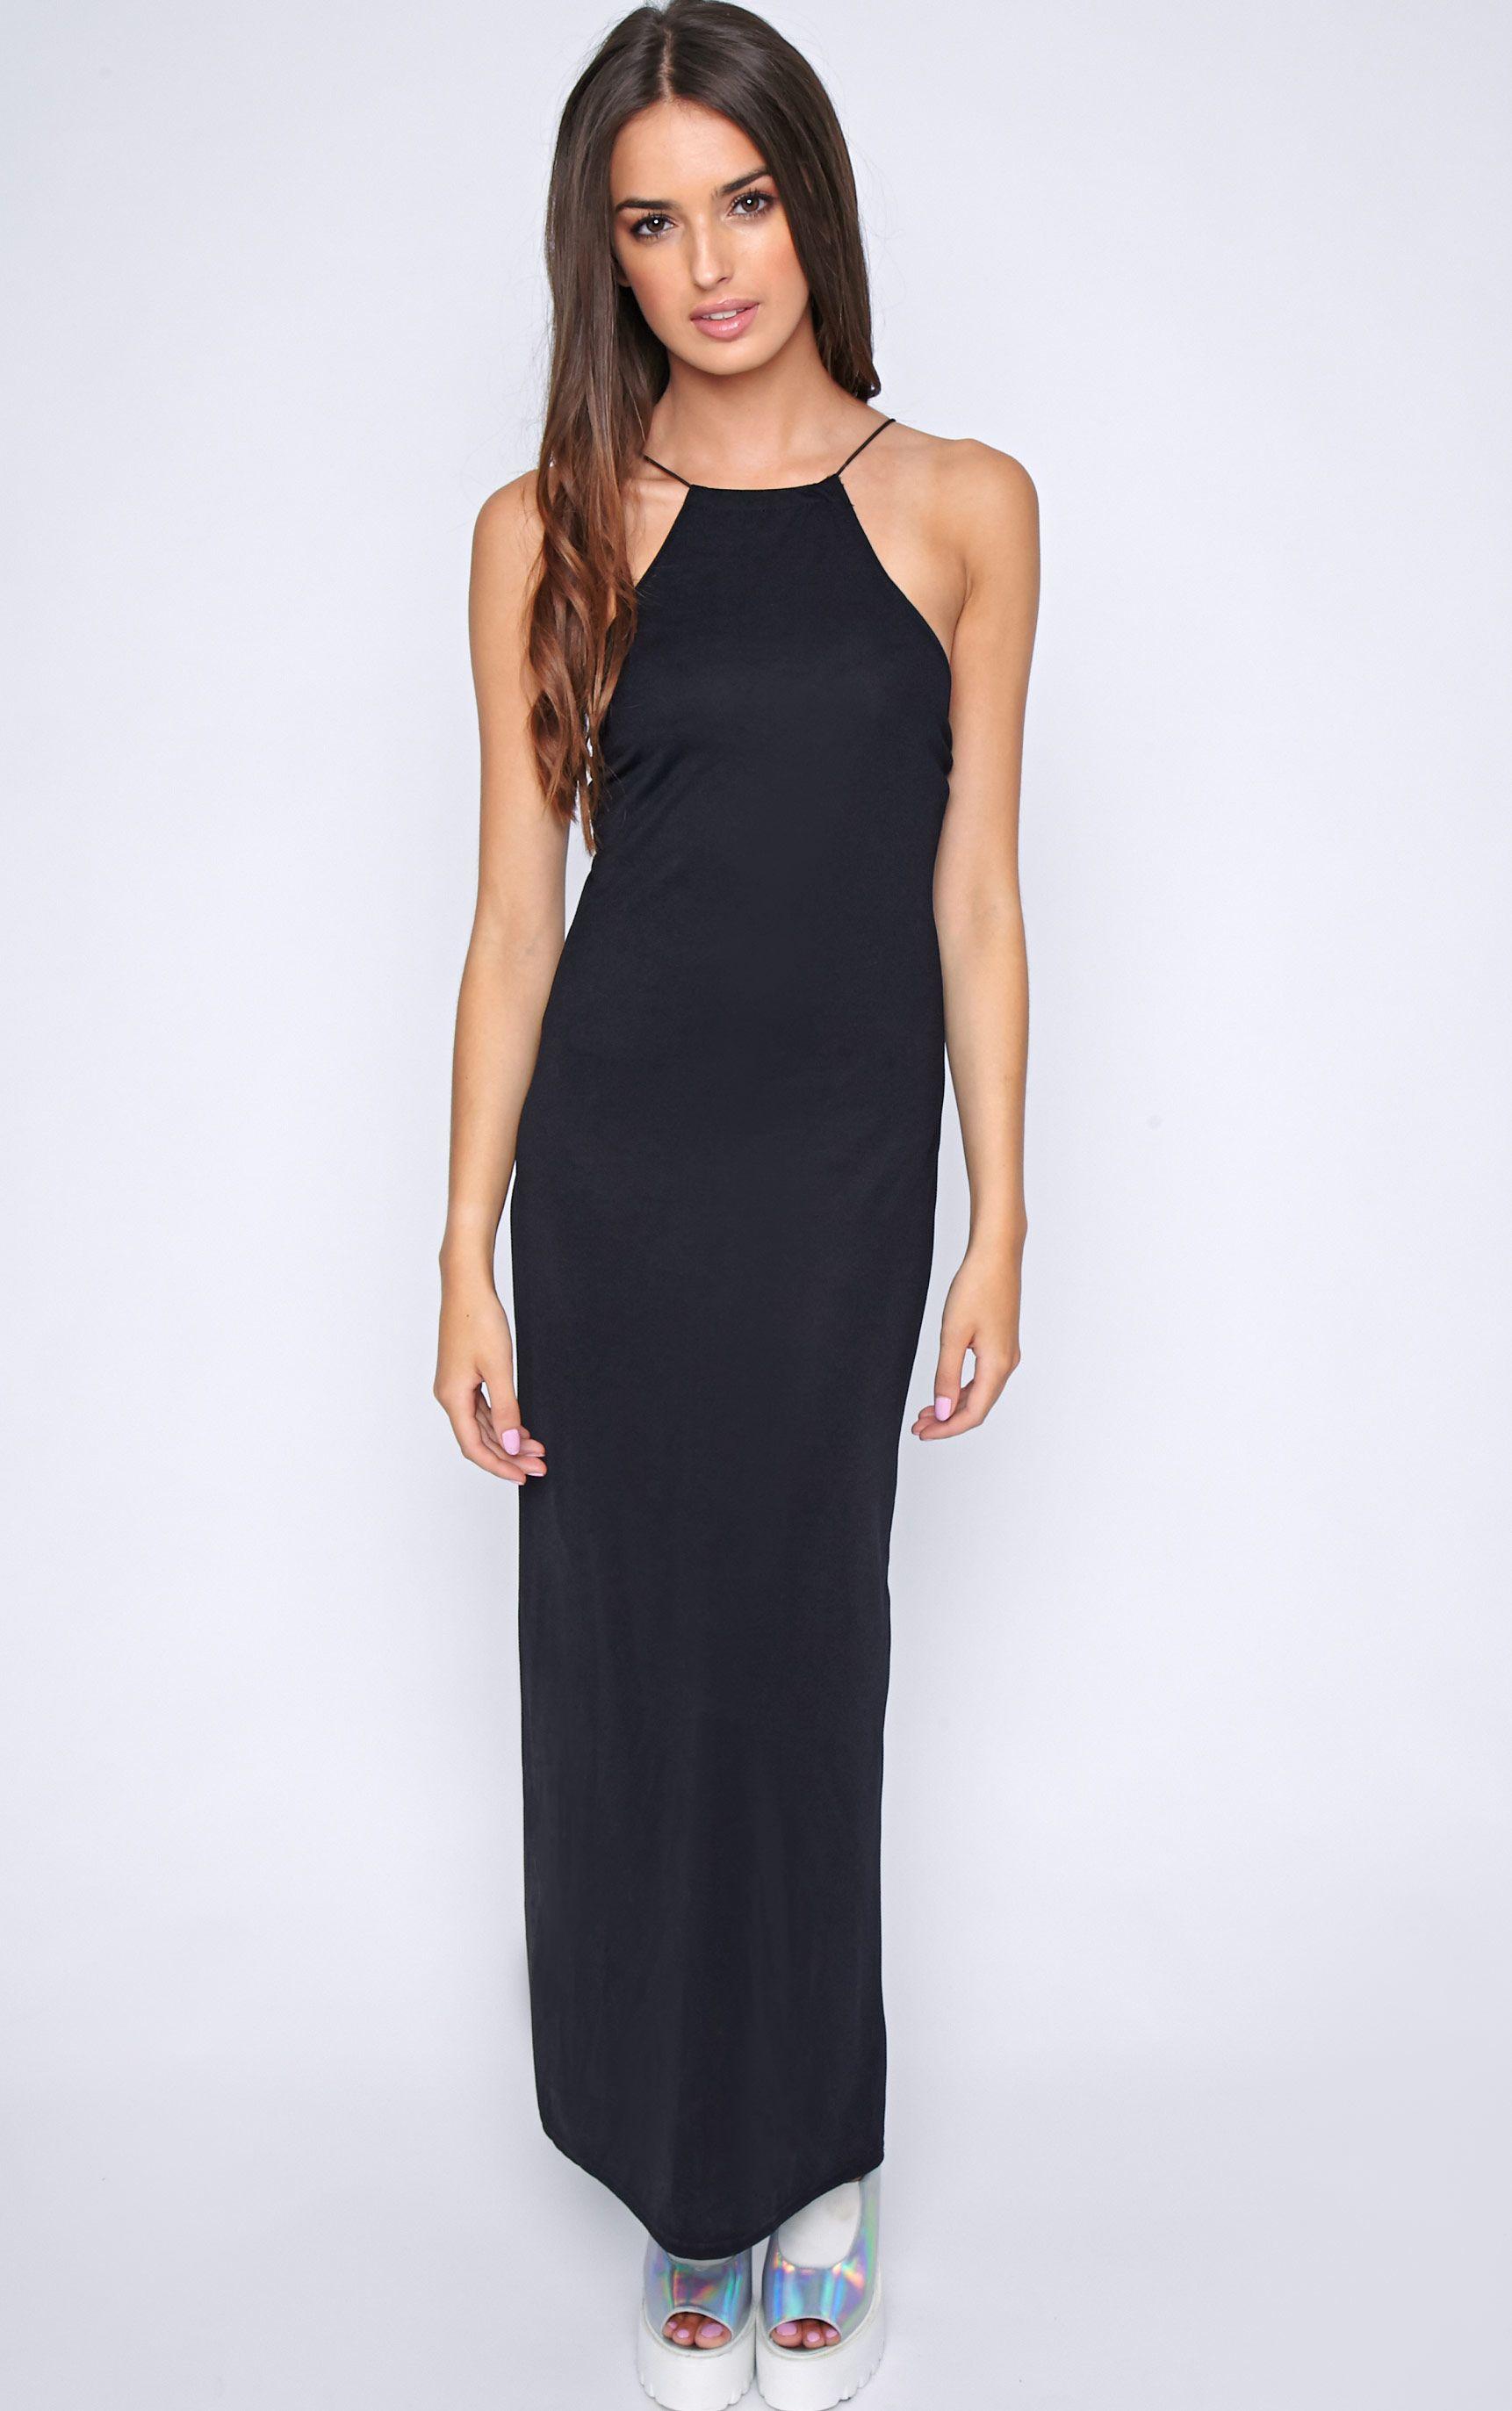 Becca Black Cross Back Maxi Dress 1